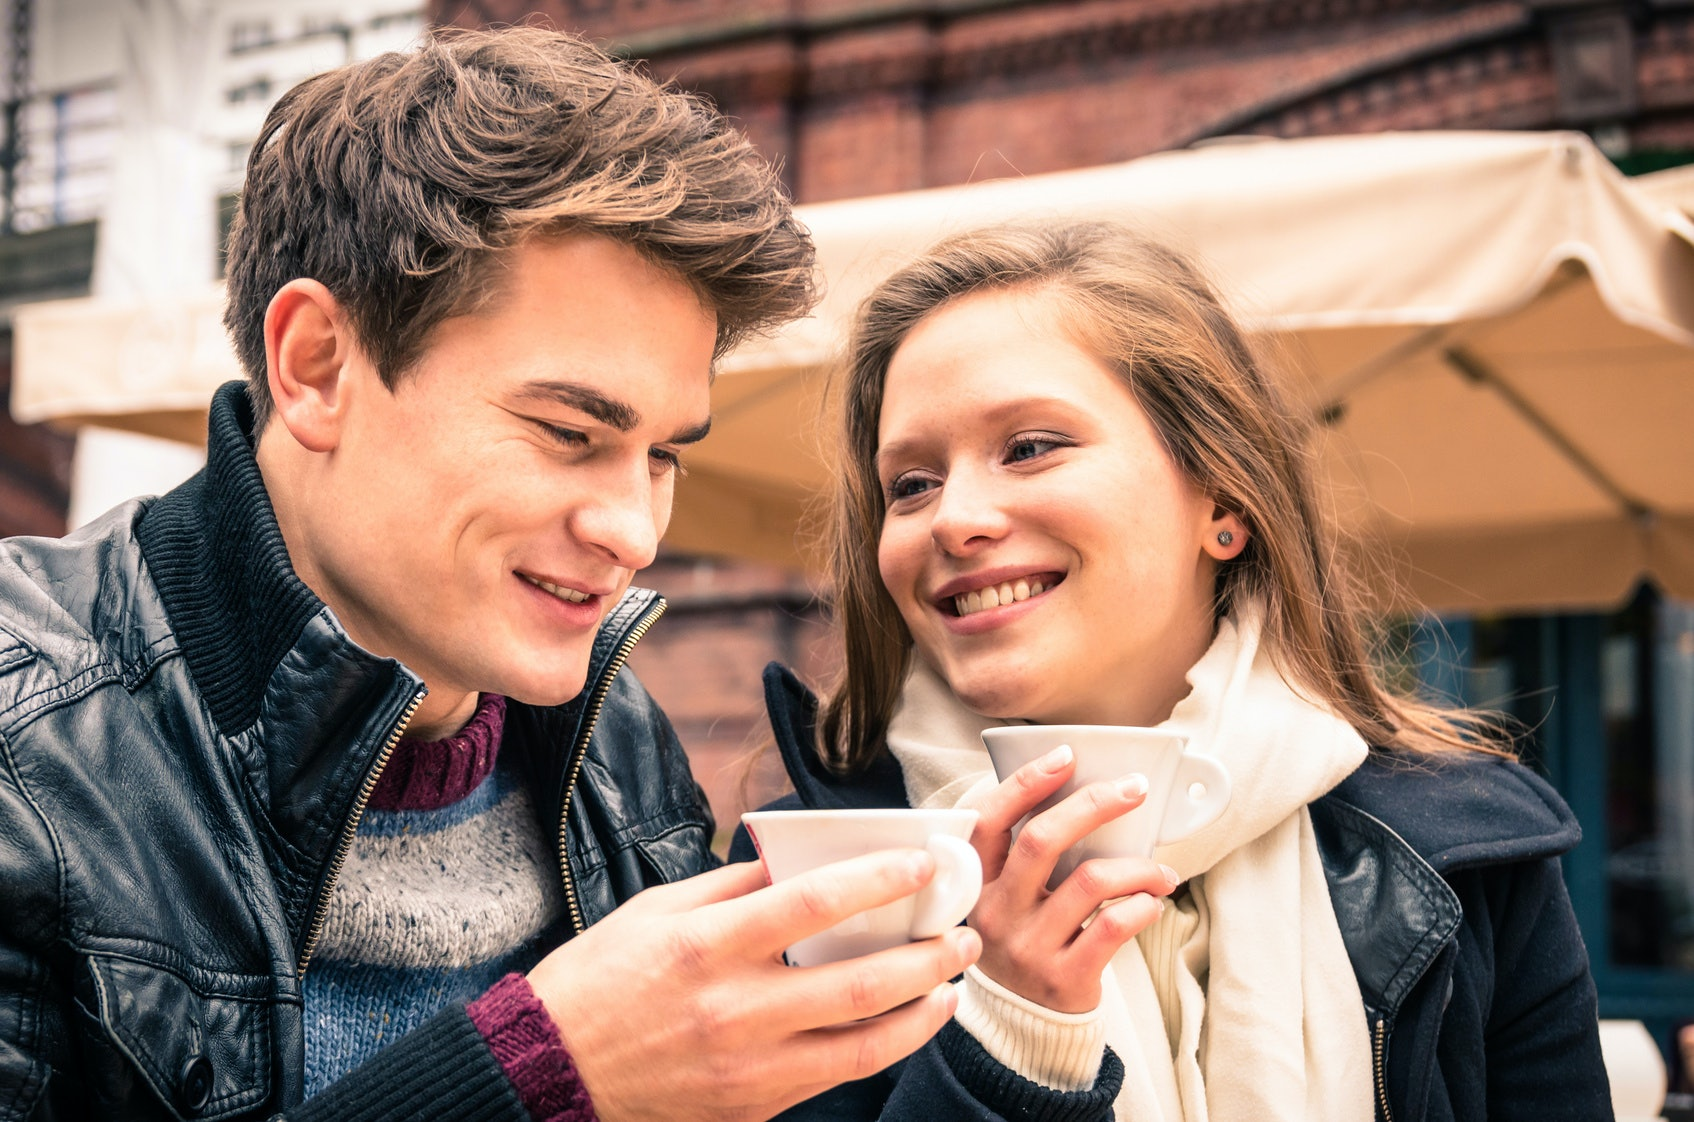 Add a profile photo to fun city dating